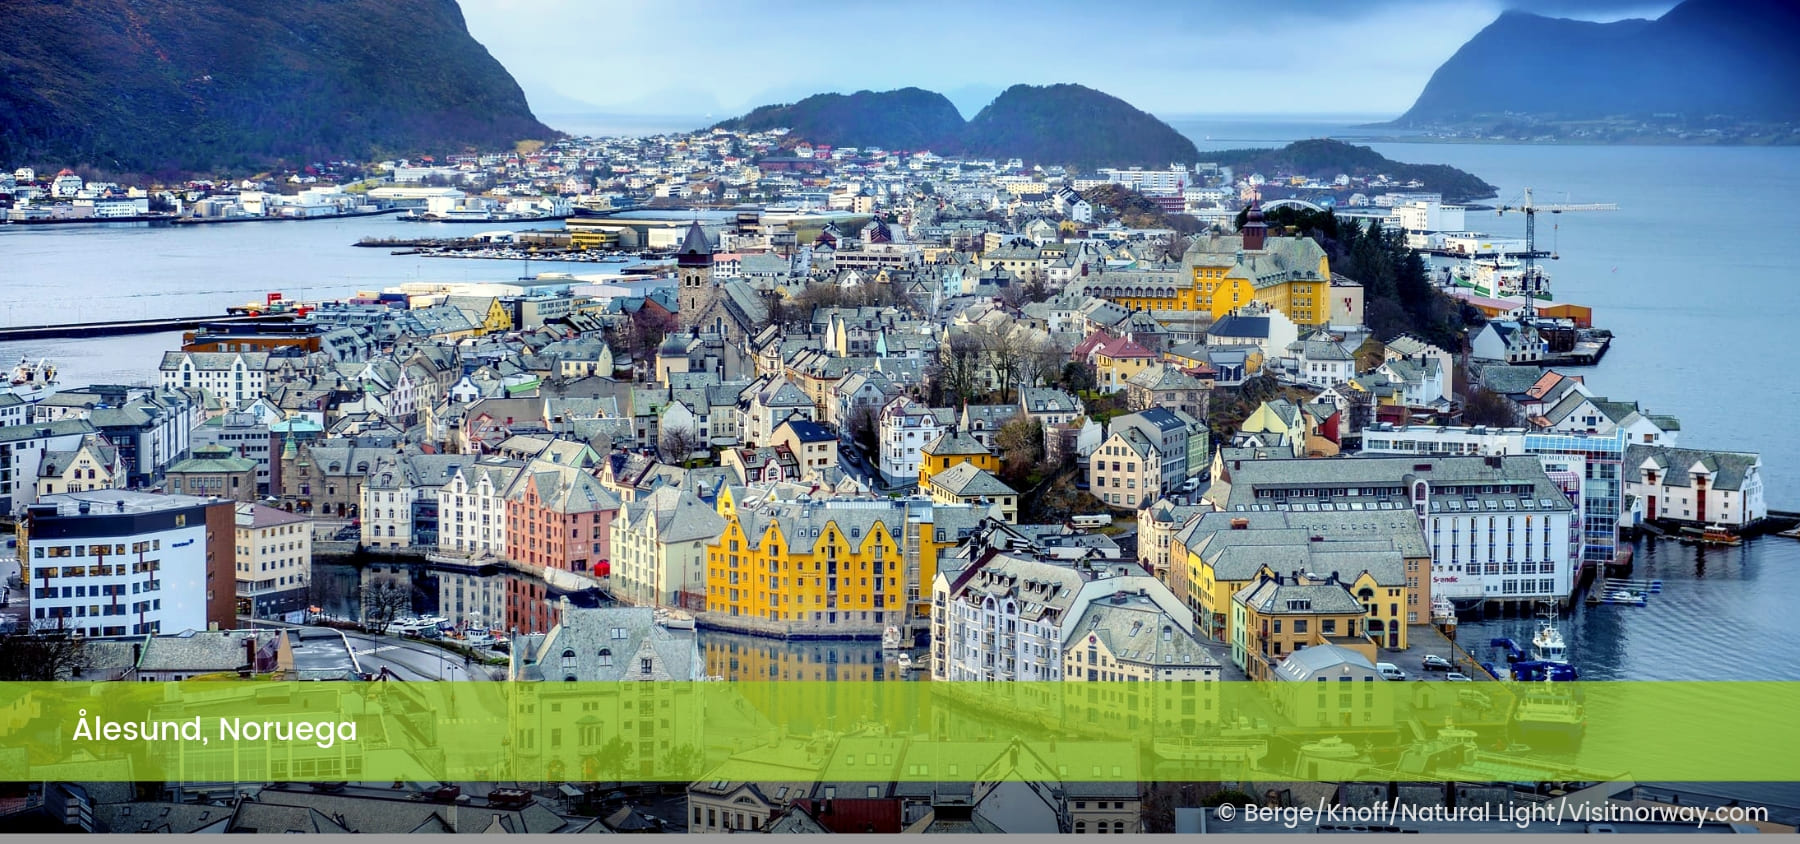 Ålesund Noruega